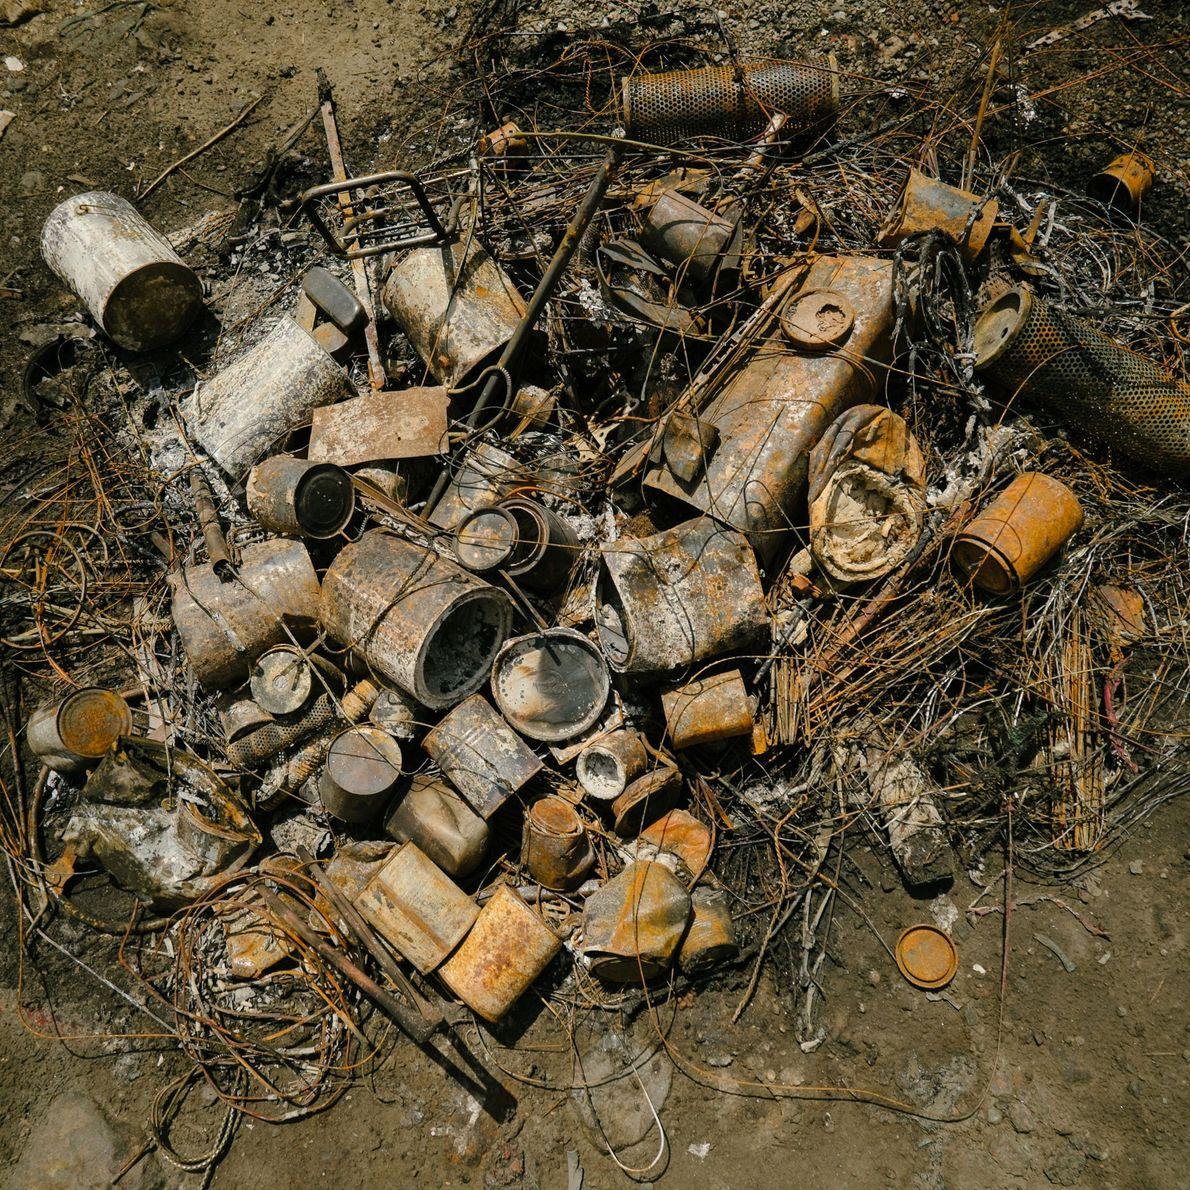 motor reciclador queima óleo na Índia